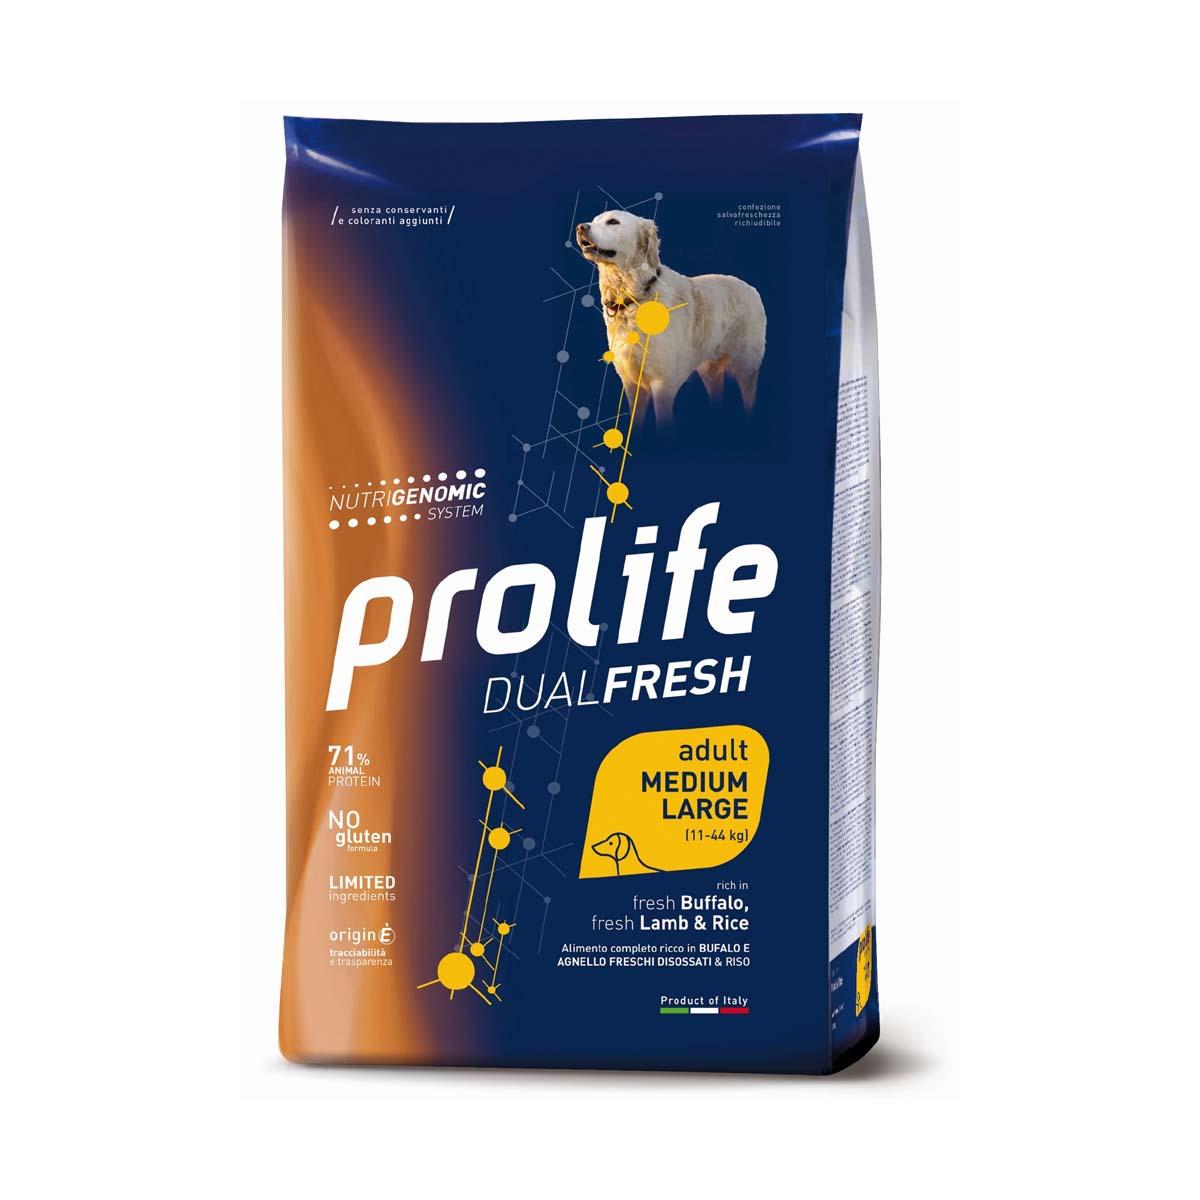 Prolife Dual Fresh Adult fresh Buffalo, fresh Lamb & Rice – Medium/Large – 2,5kg